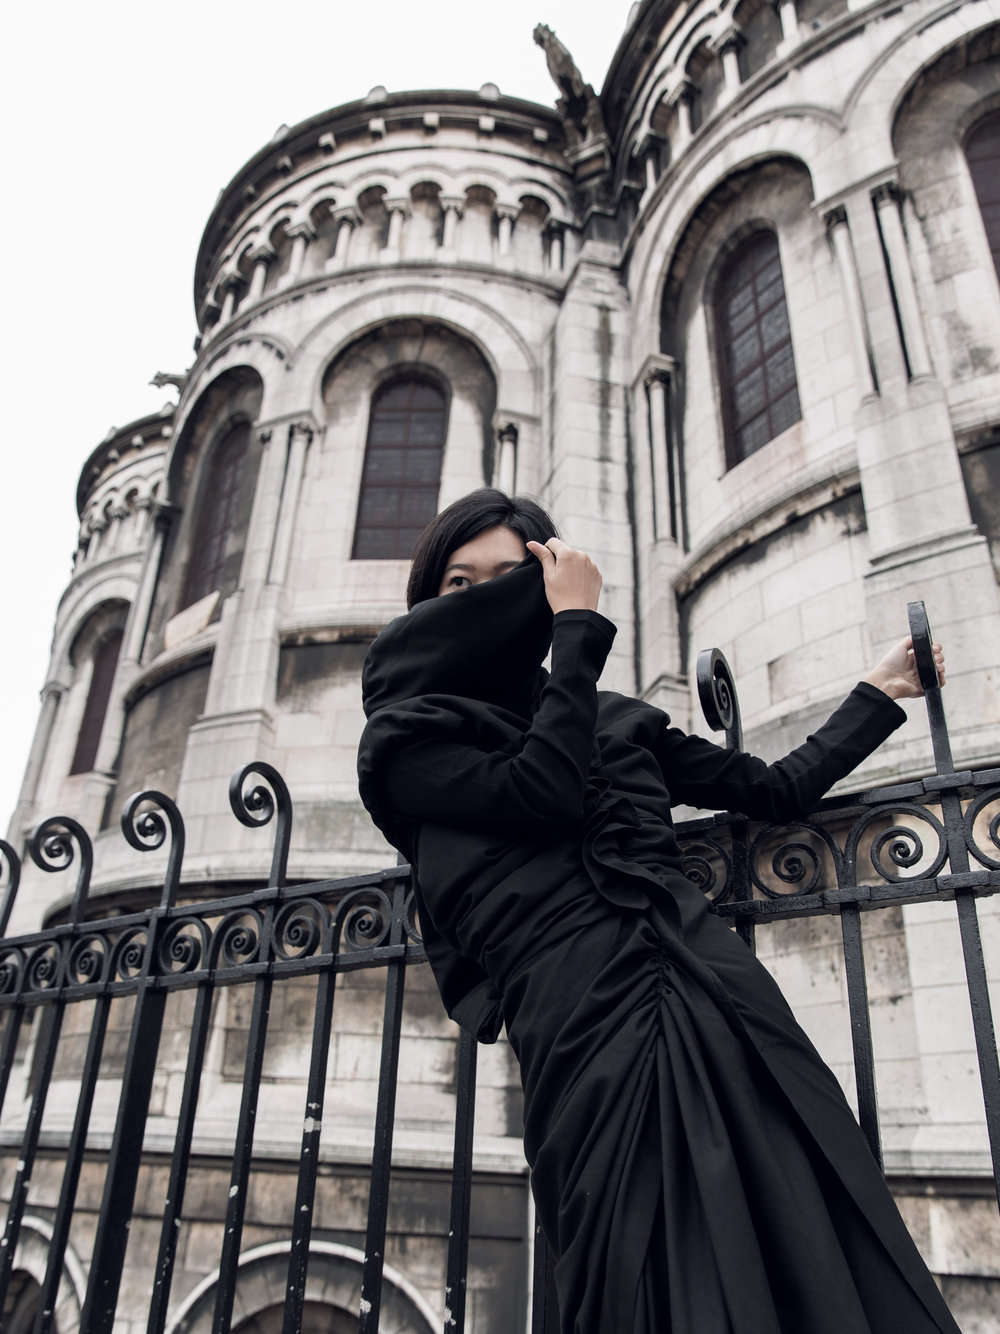 thian_tb_fieulaine_1_yohji_Paris.jpg